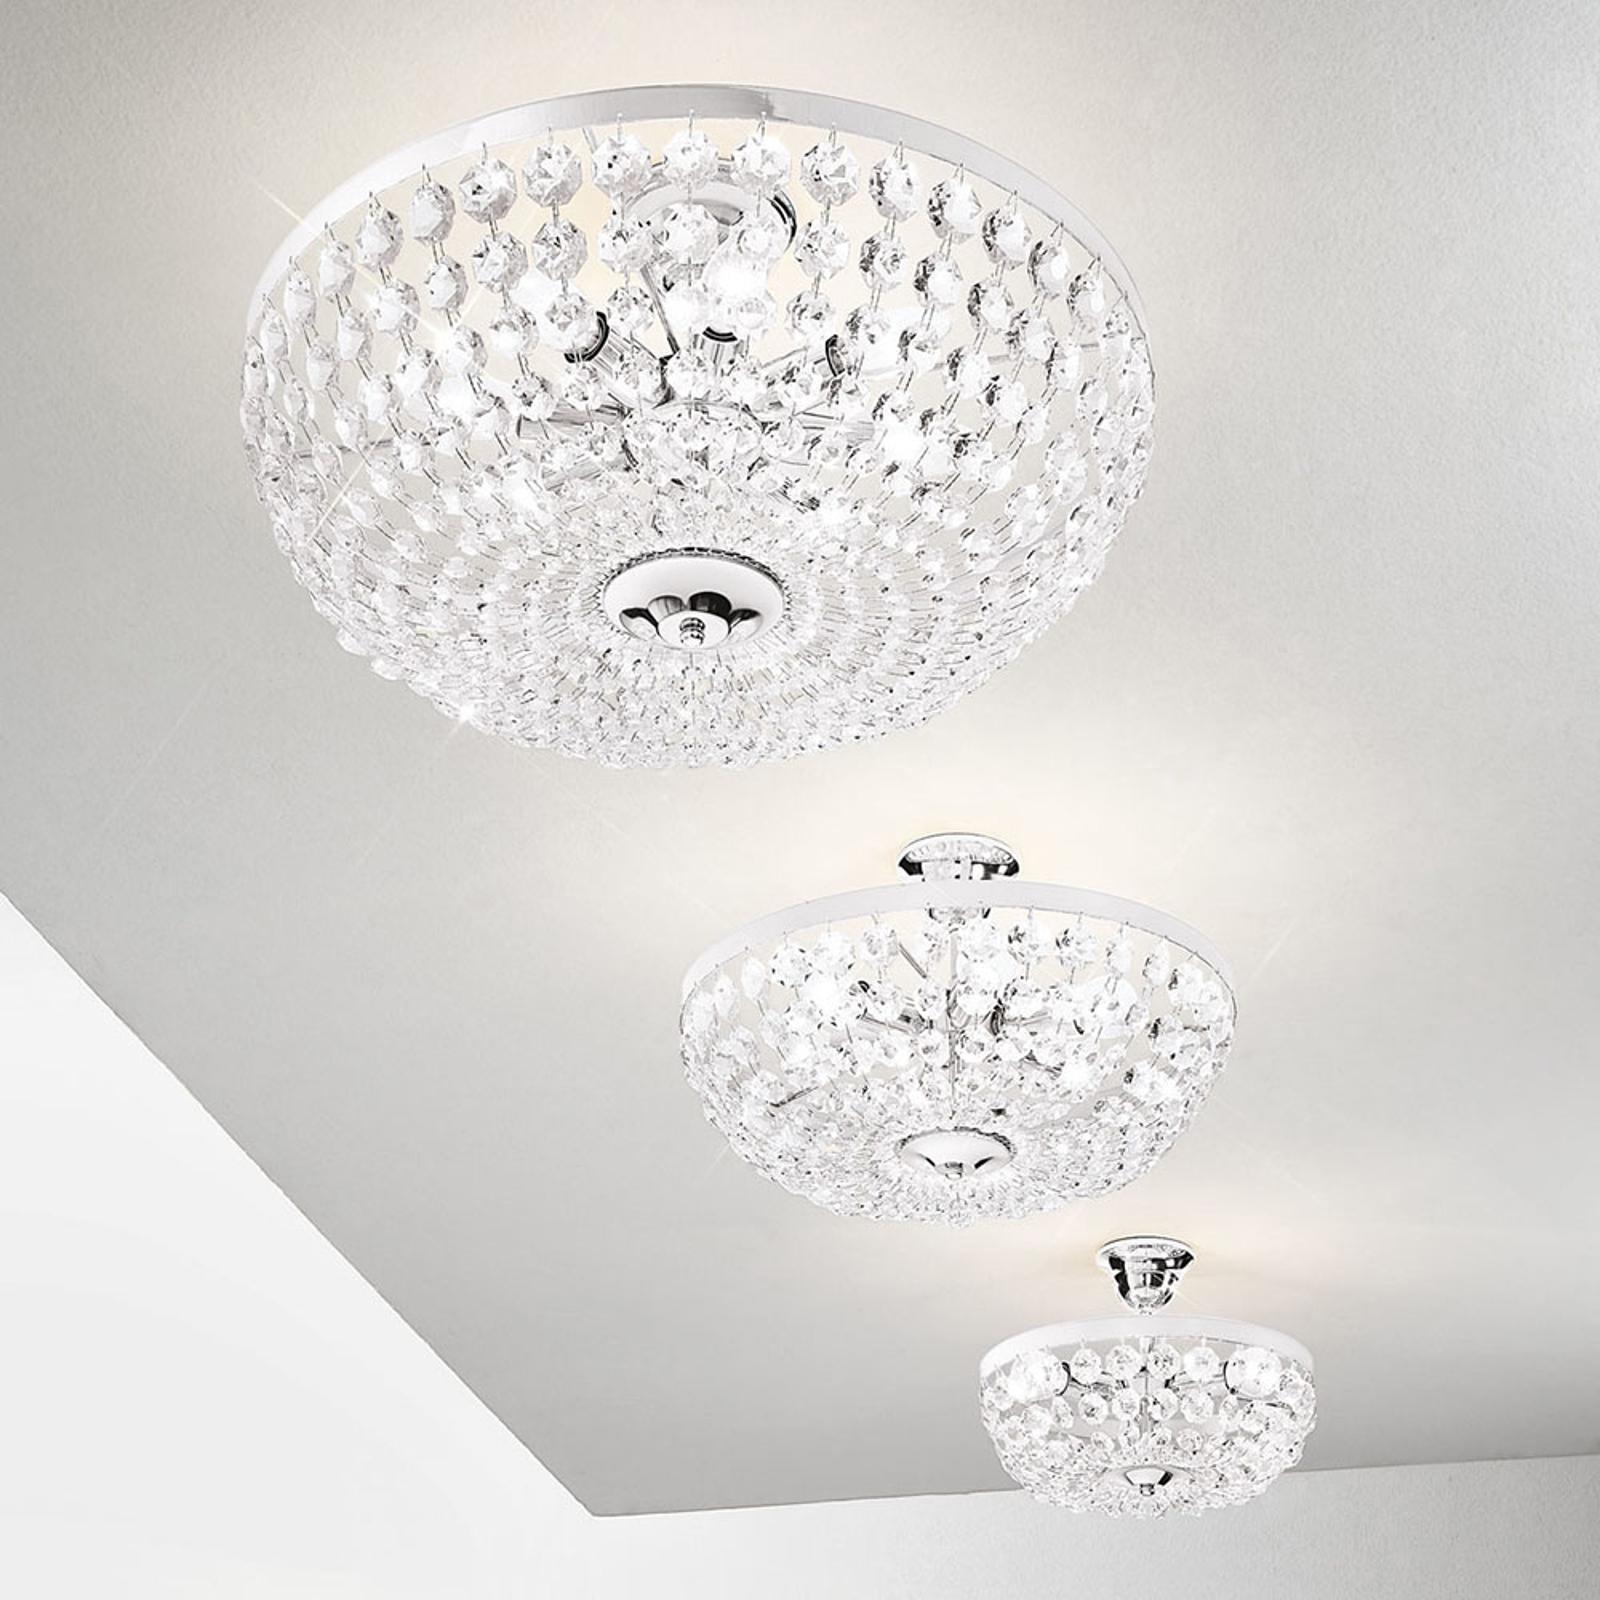 Lampa sufitowa Valerie, chrom, Ø 40 cm